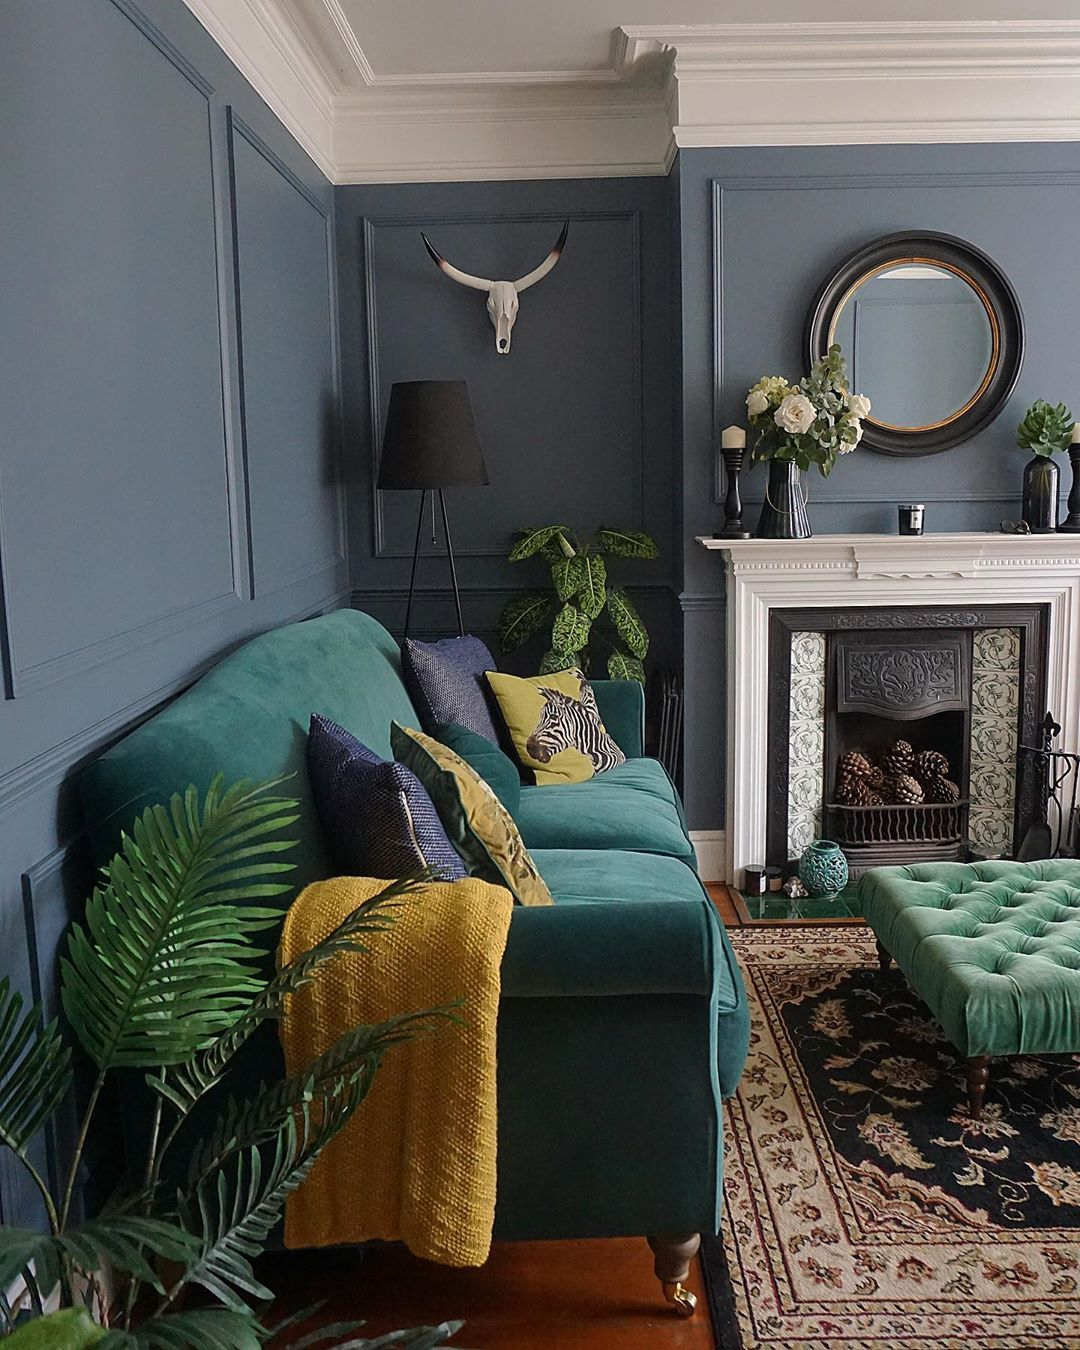 Pin By Rachel Ferguson On Denver Home Decor In 2020 Victorian Living Room Living Room Color Interior Design Bedroom Small